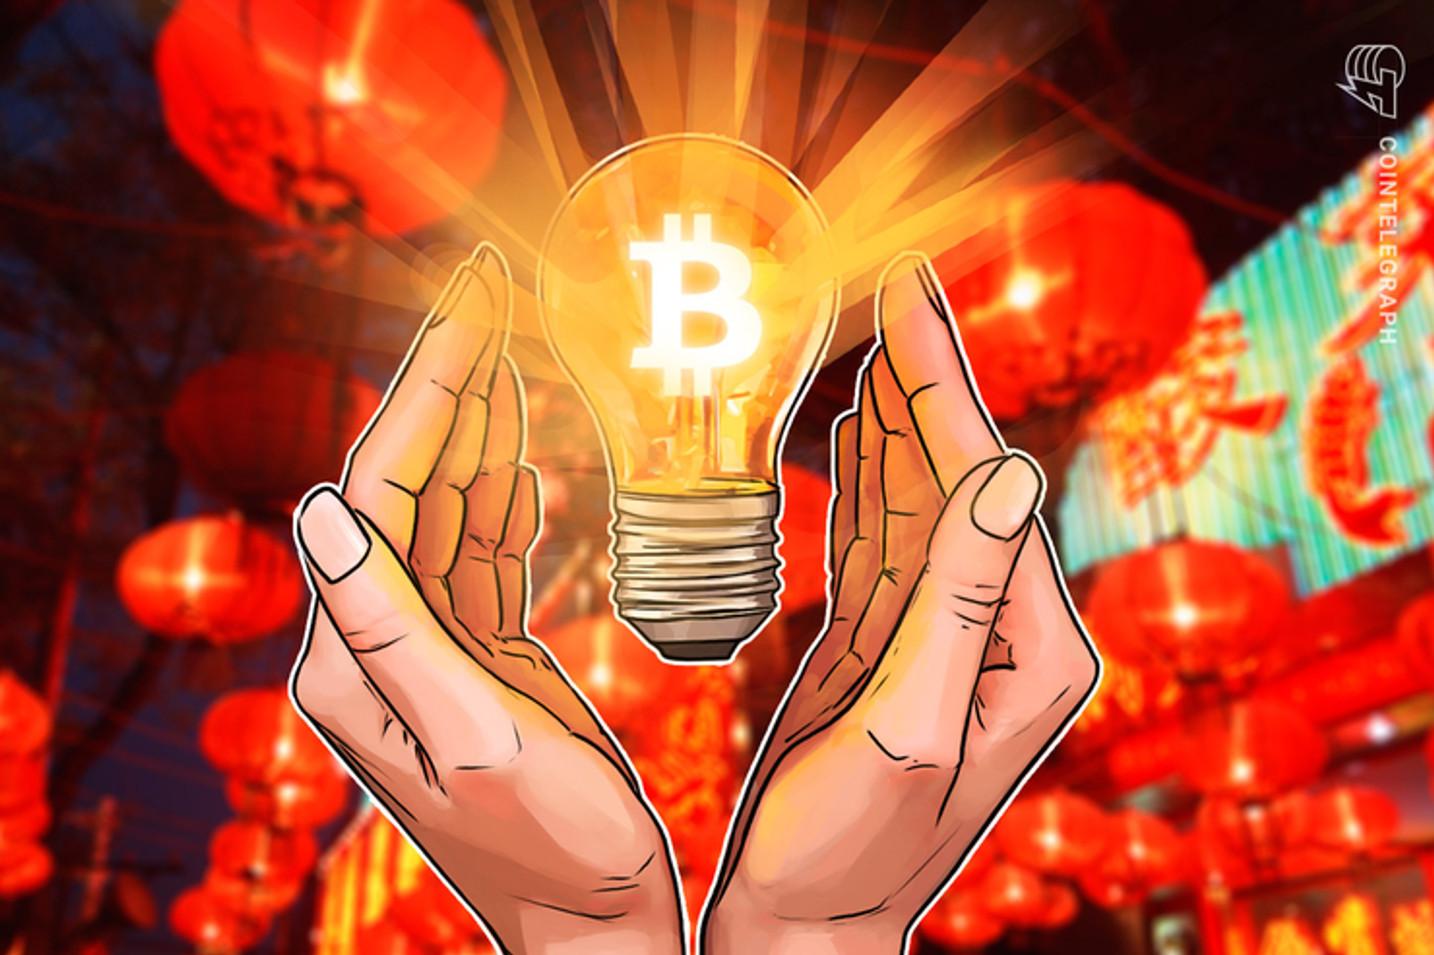 CVM lança audiência pública sobre crowdfunding de investimento e pode beneficiar industria cripto/blockchain no Brasil